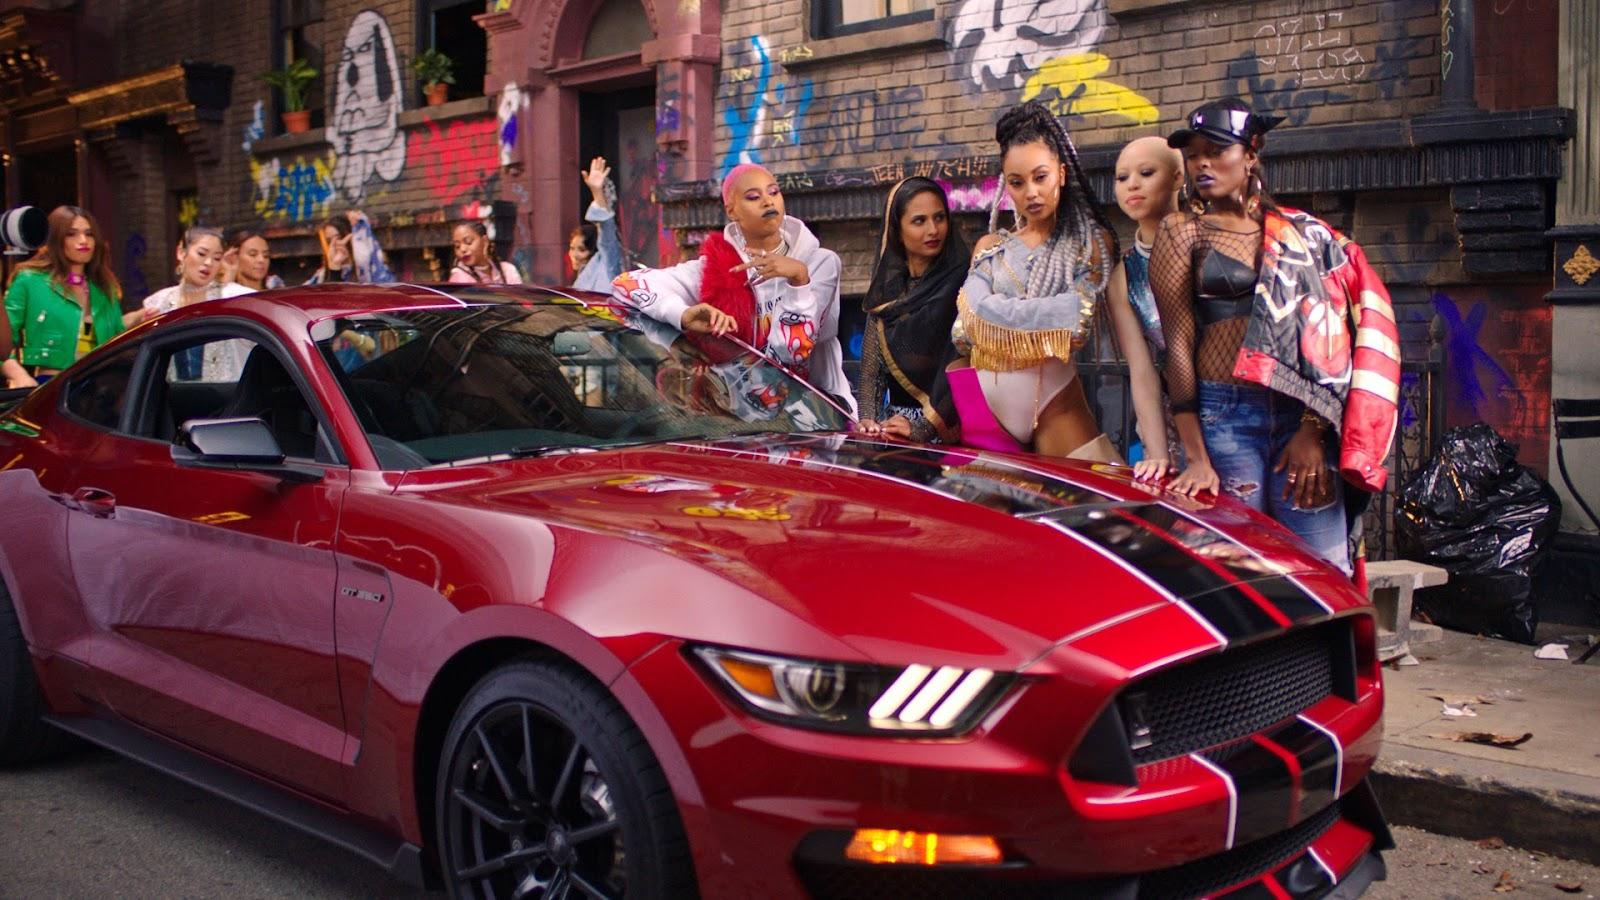 LittleMix Mustang Η Ford Mustang τα σπάει μαζί με τις Little Mix Ford, Ford Mustang, Fun, Little Mix, videos